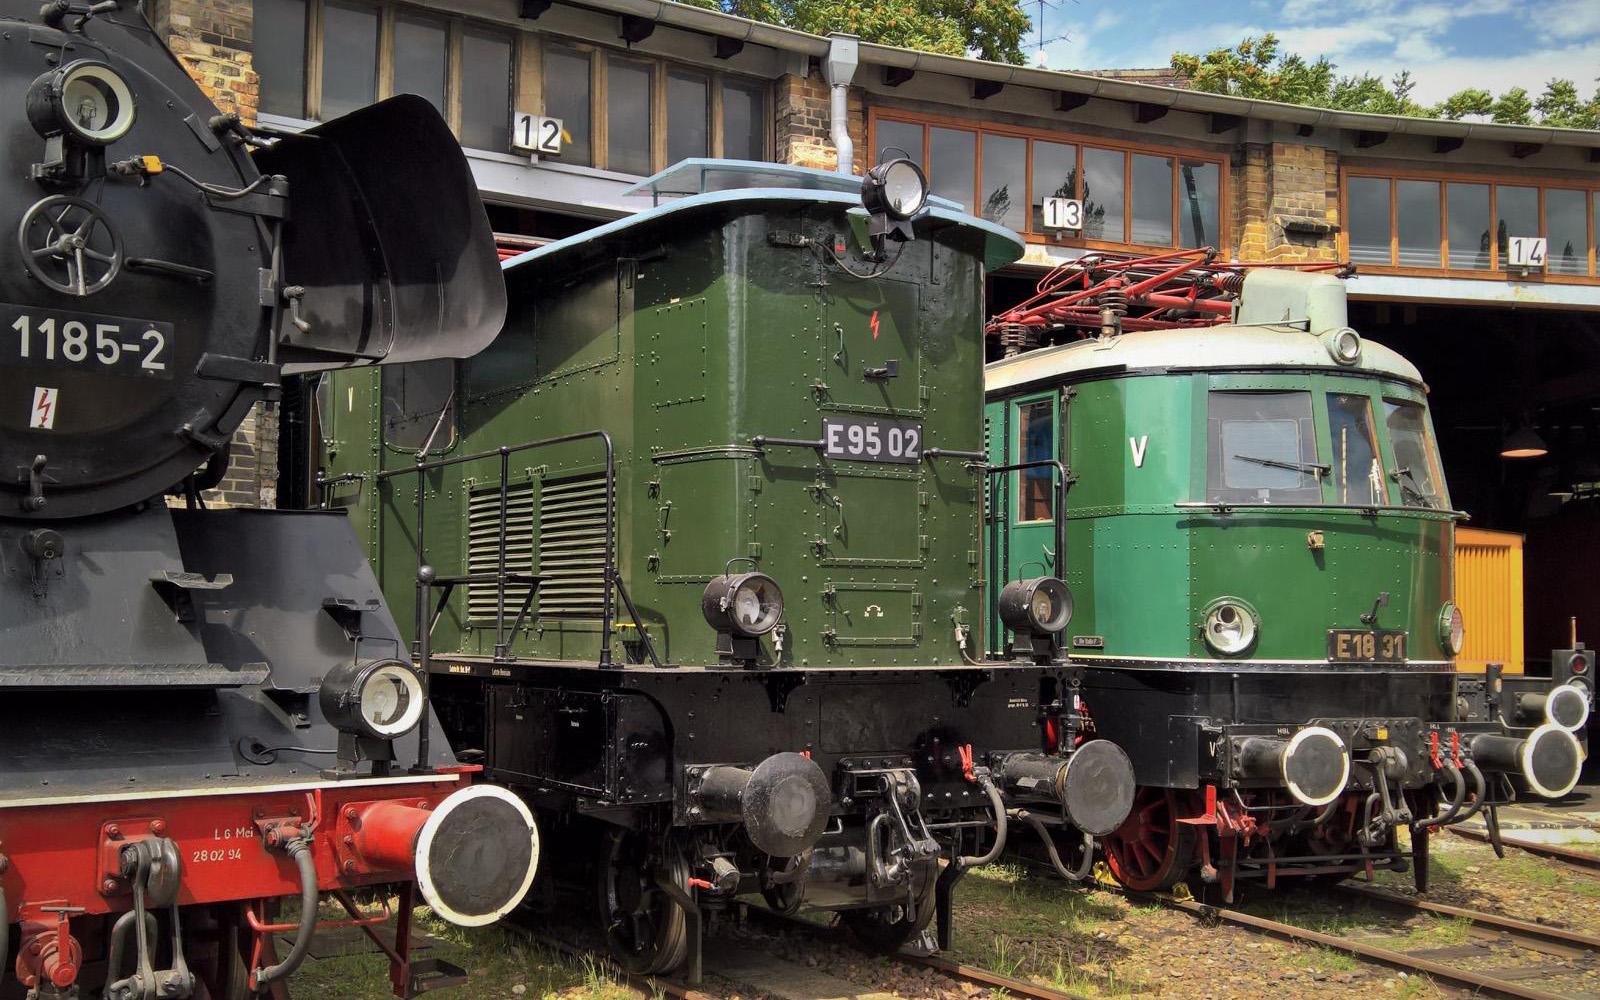 ©Foto: Christian Wodzinski | railmen | Güterzuglokomotive E95 02 BJ 1927 sowie die Elektrolokomotive 18 31 BJ 1937 im DB Museum Halle